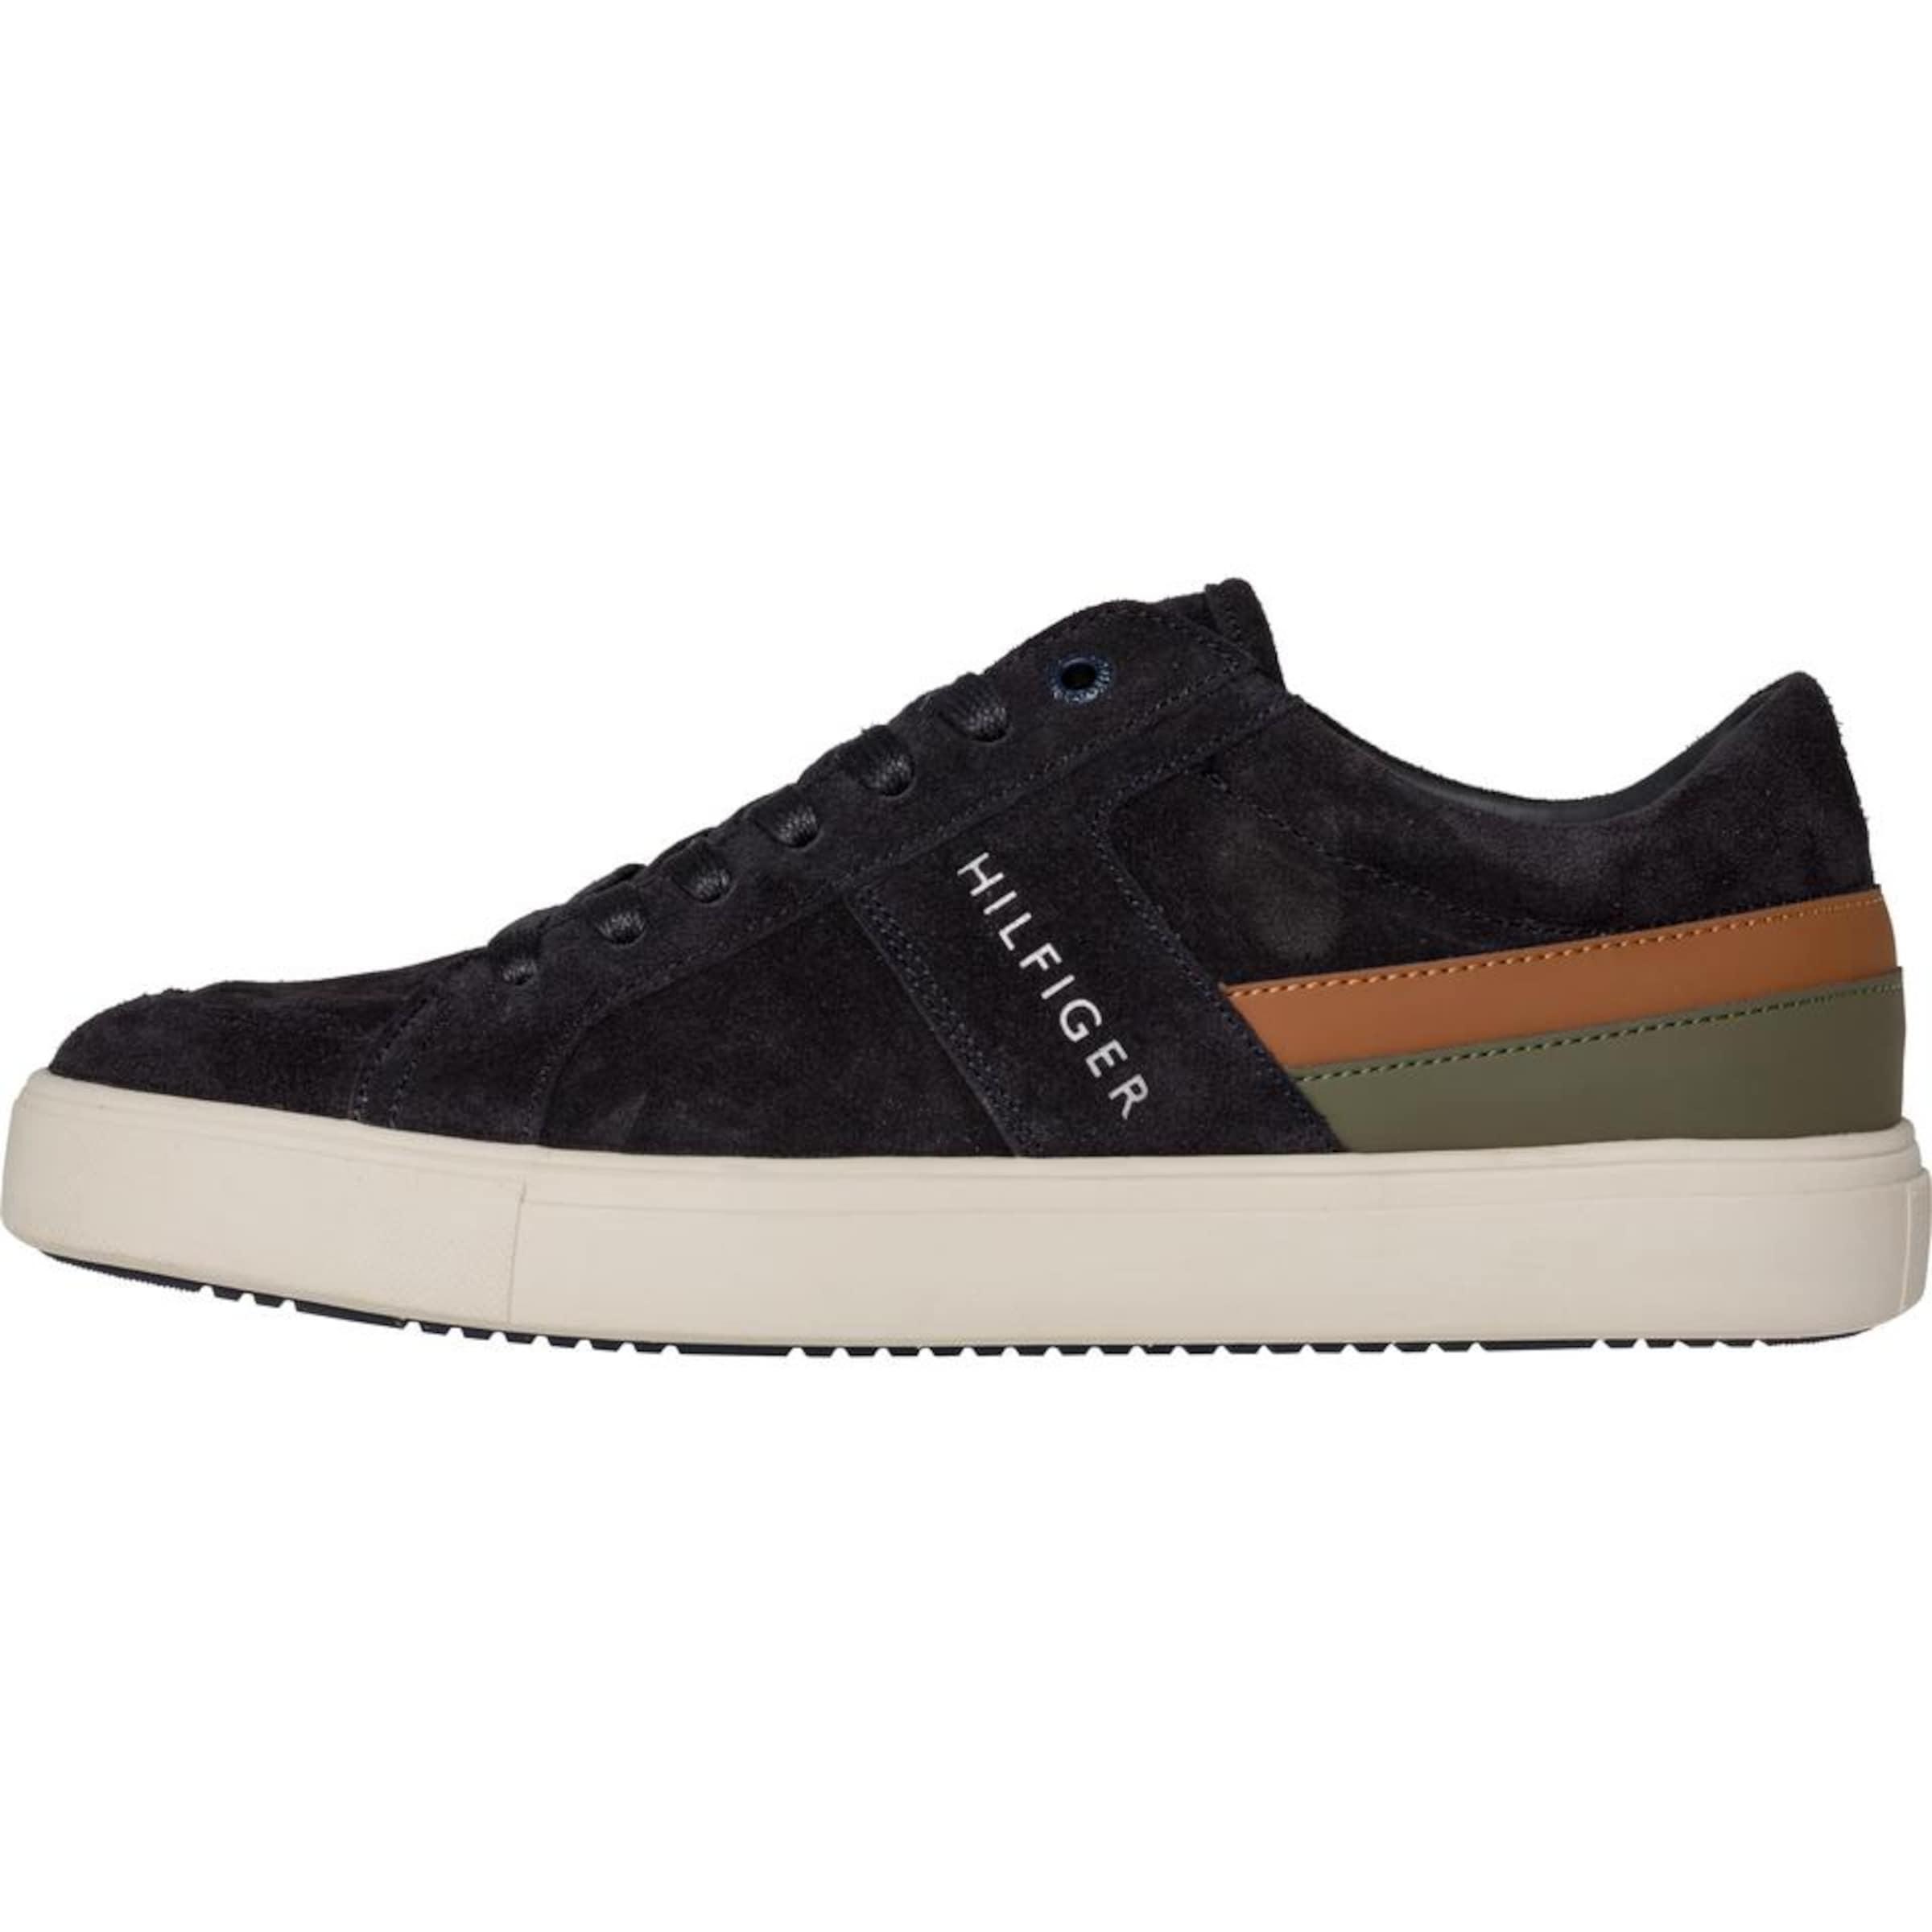 TOMMY HILFIGER Sneaker »M2285OON 1C2« Hohe Qualität